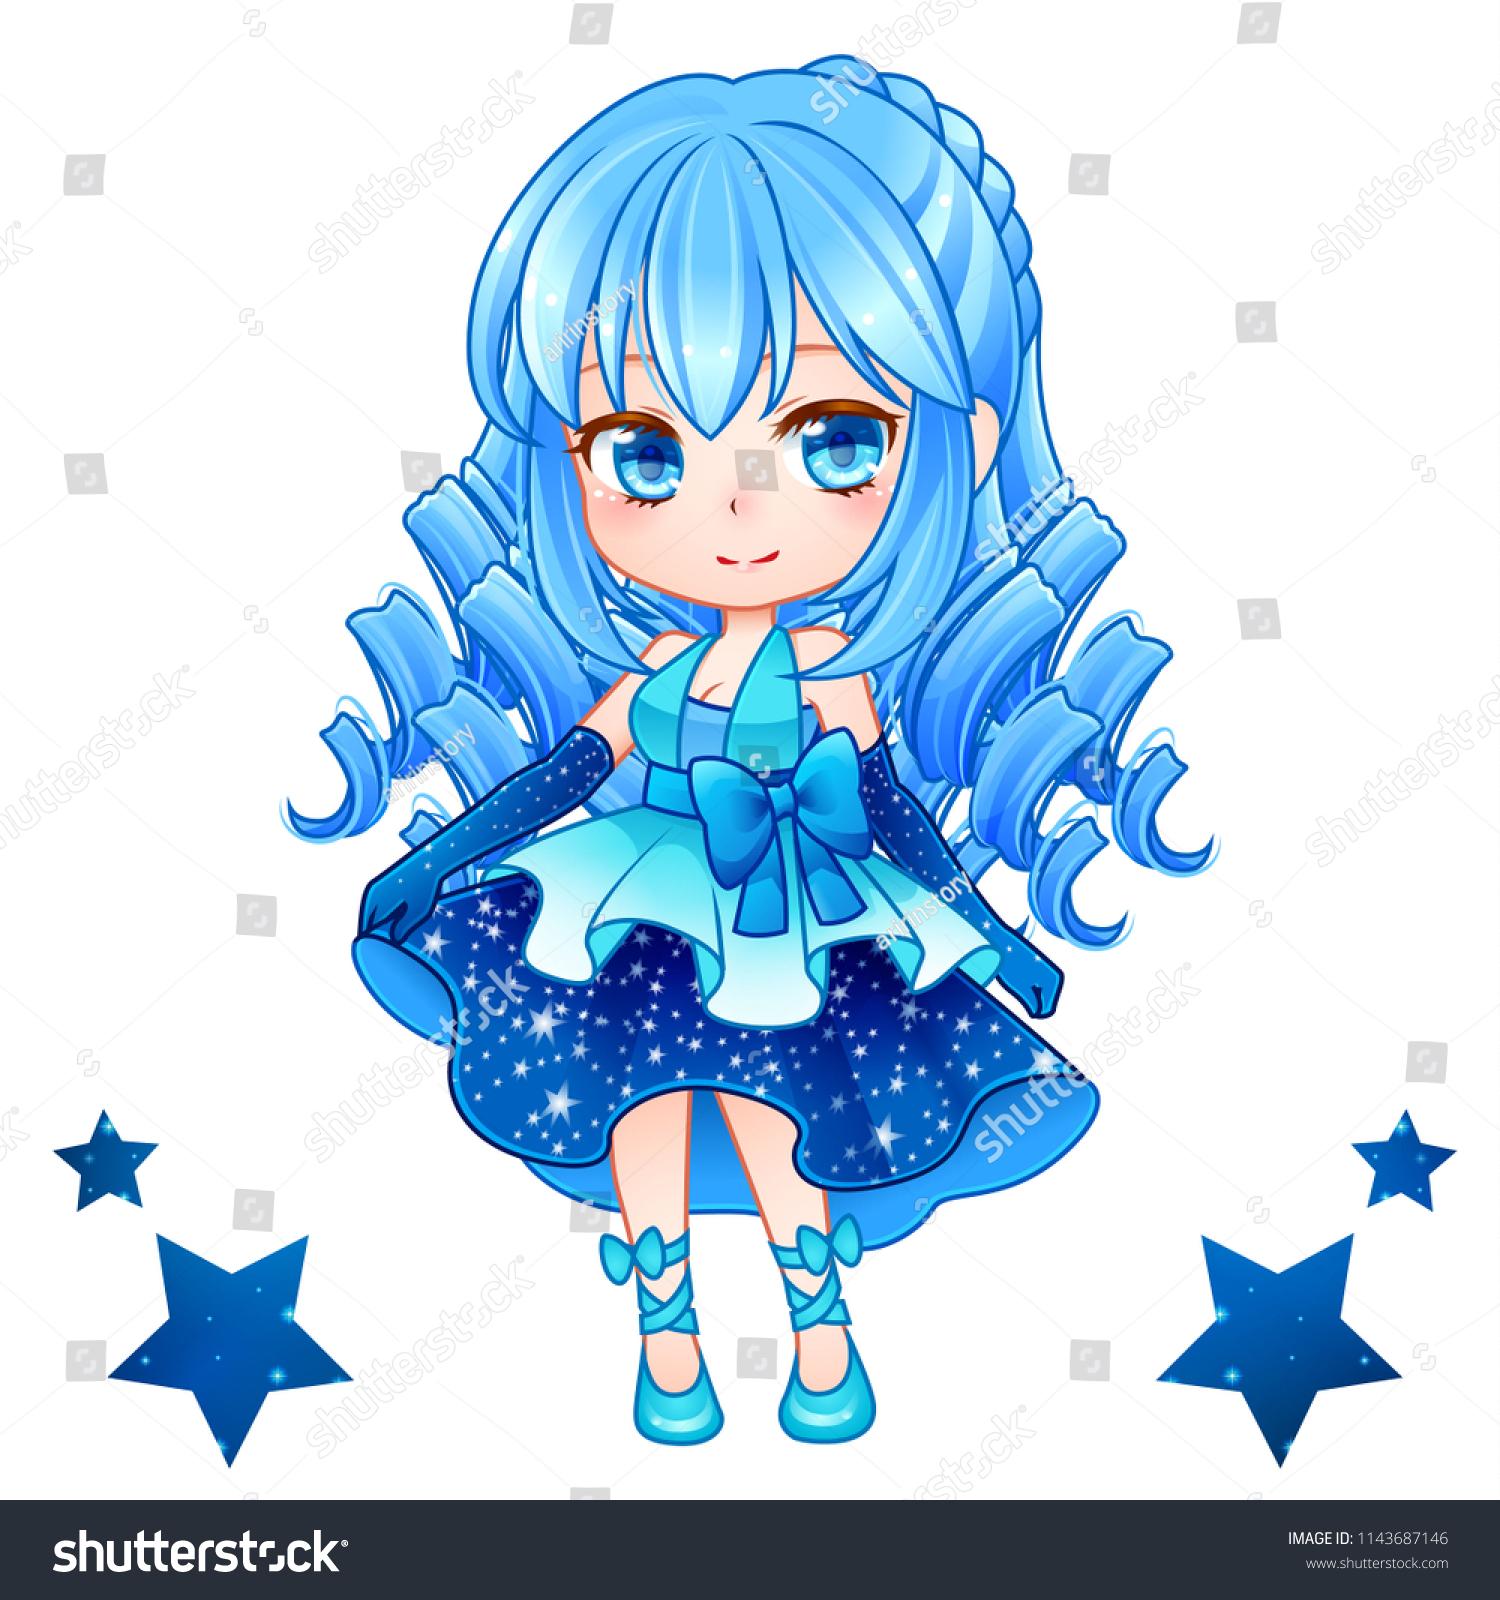 Cute Vector Illustration Beautiful Chibi Zodiac Stock Vector Royalty Free 1143687146